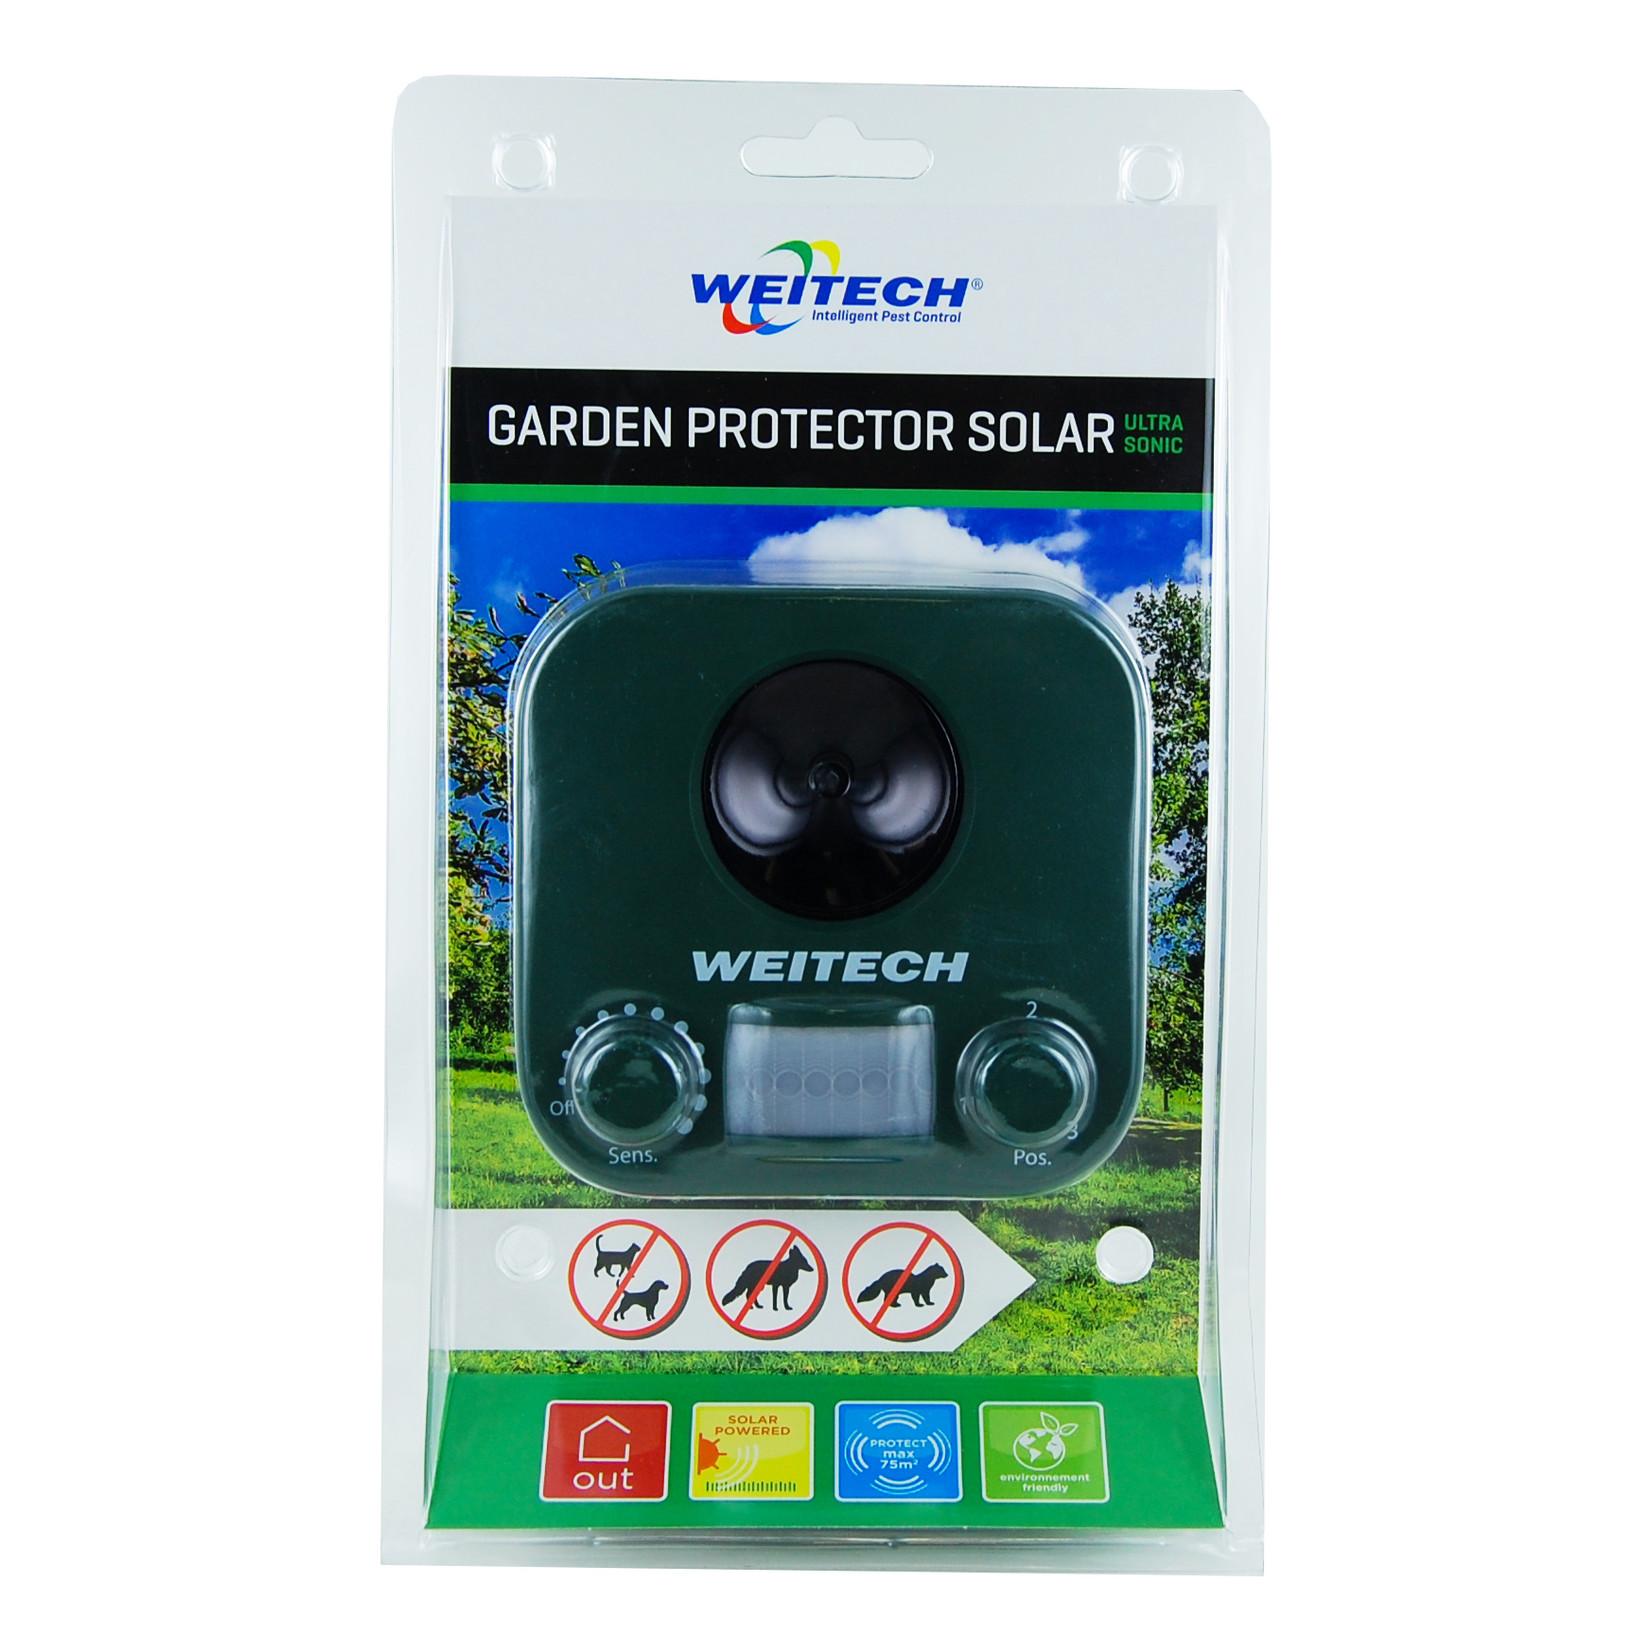 Weitech Garden Protector Solar W0053 Ongedierte verjager op zonne-energie